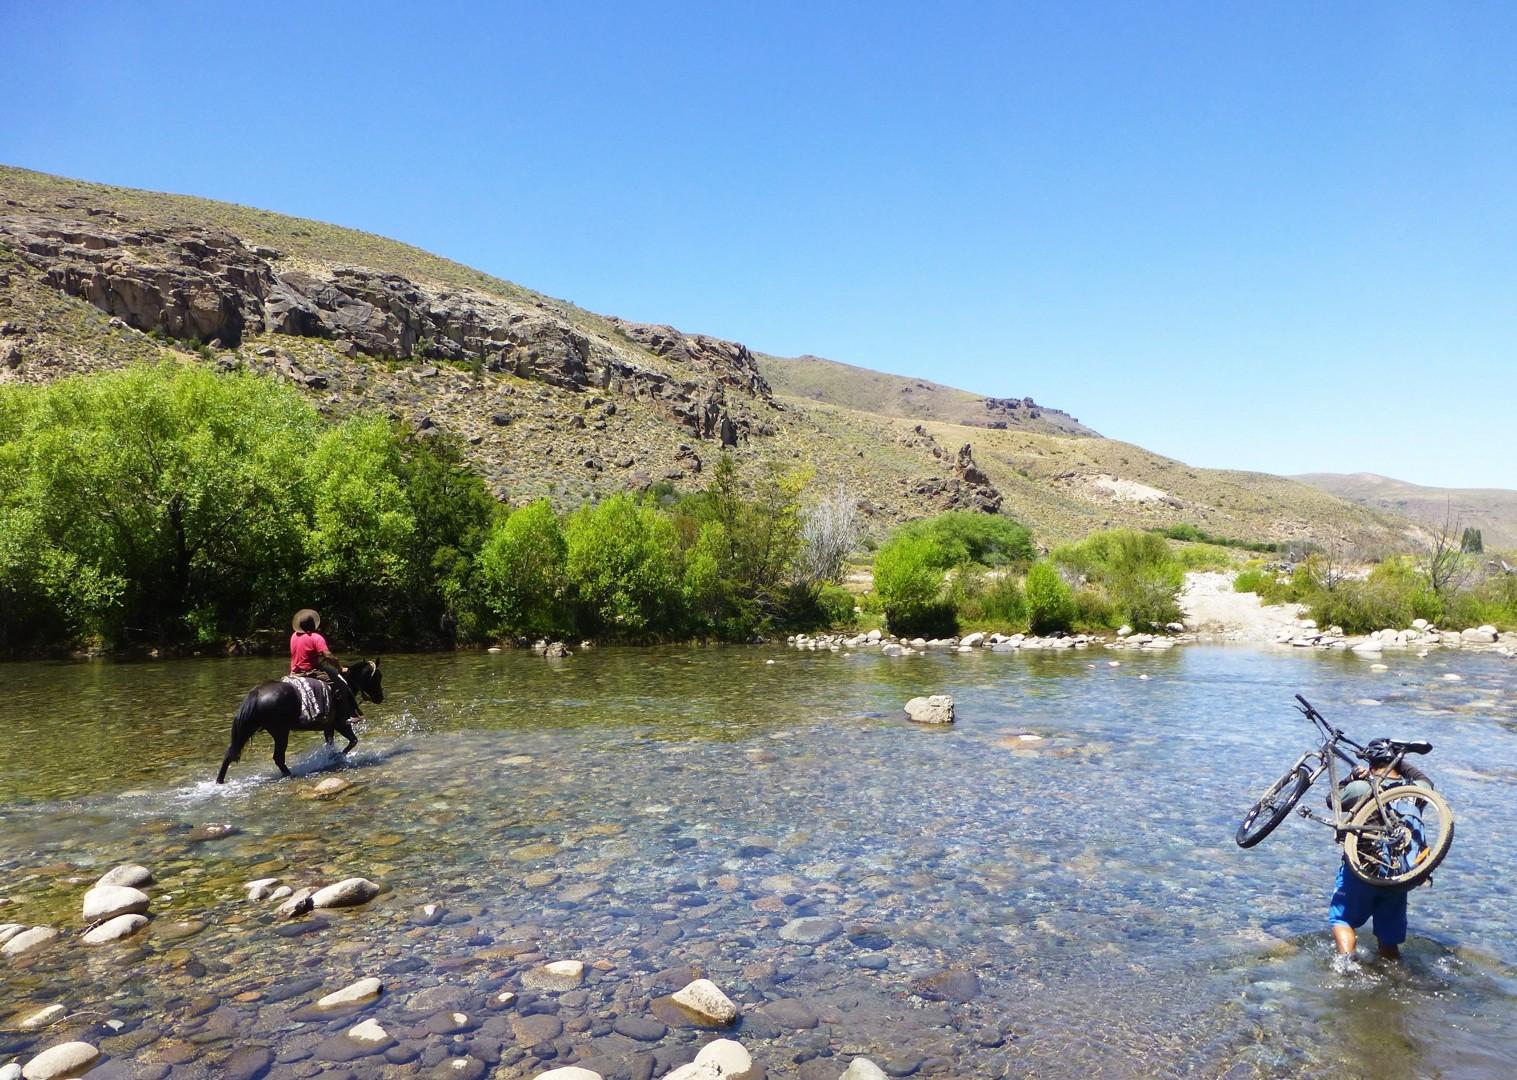 _Holiday.711.13649.jpg - Chile and Argentina - Wild Patagonia - Mountain Biking